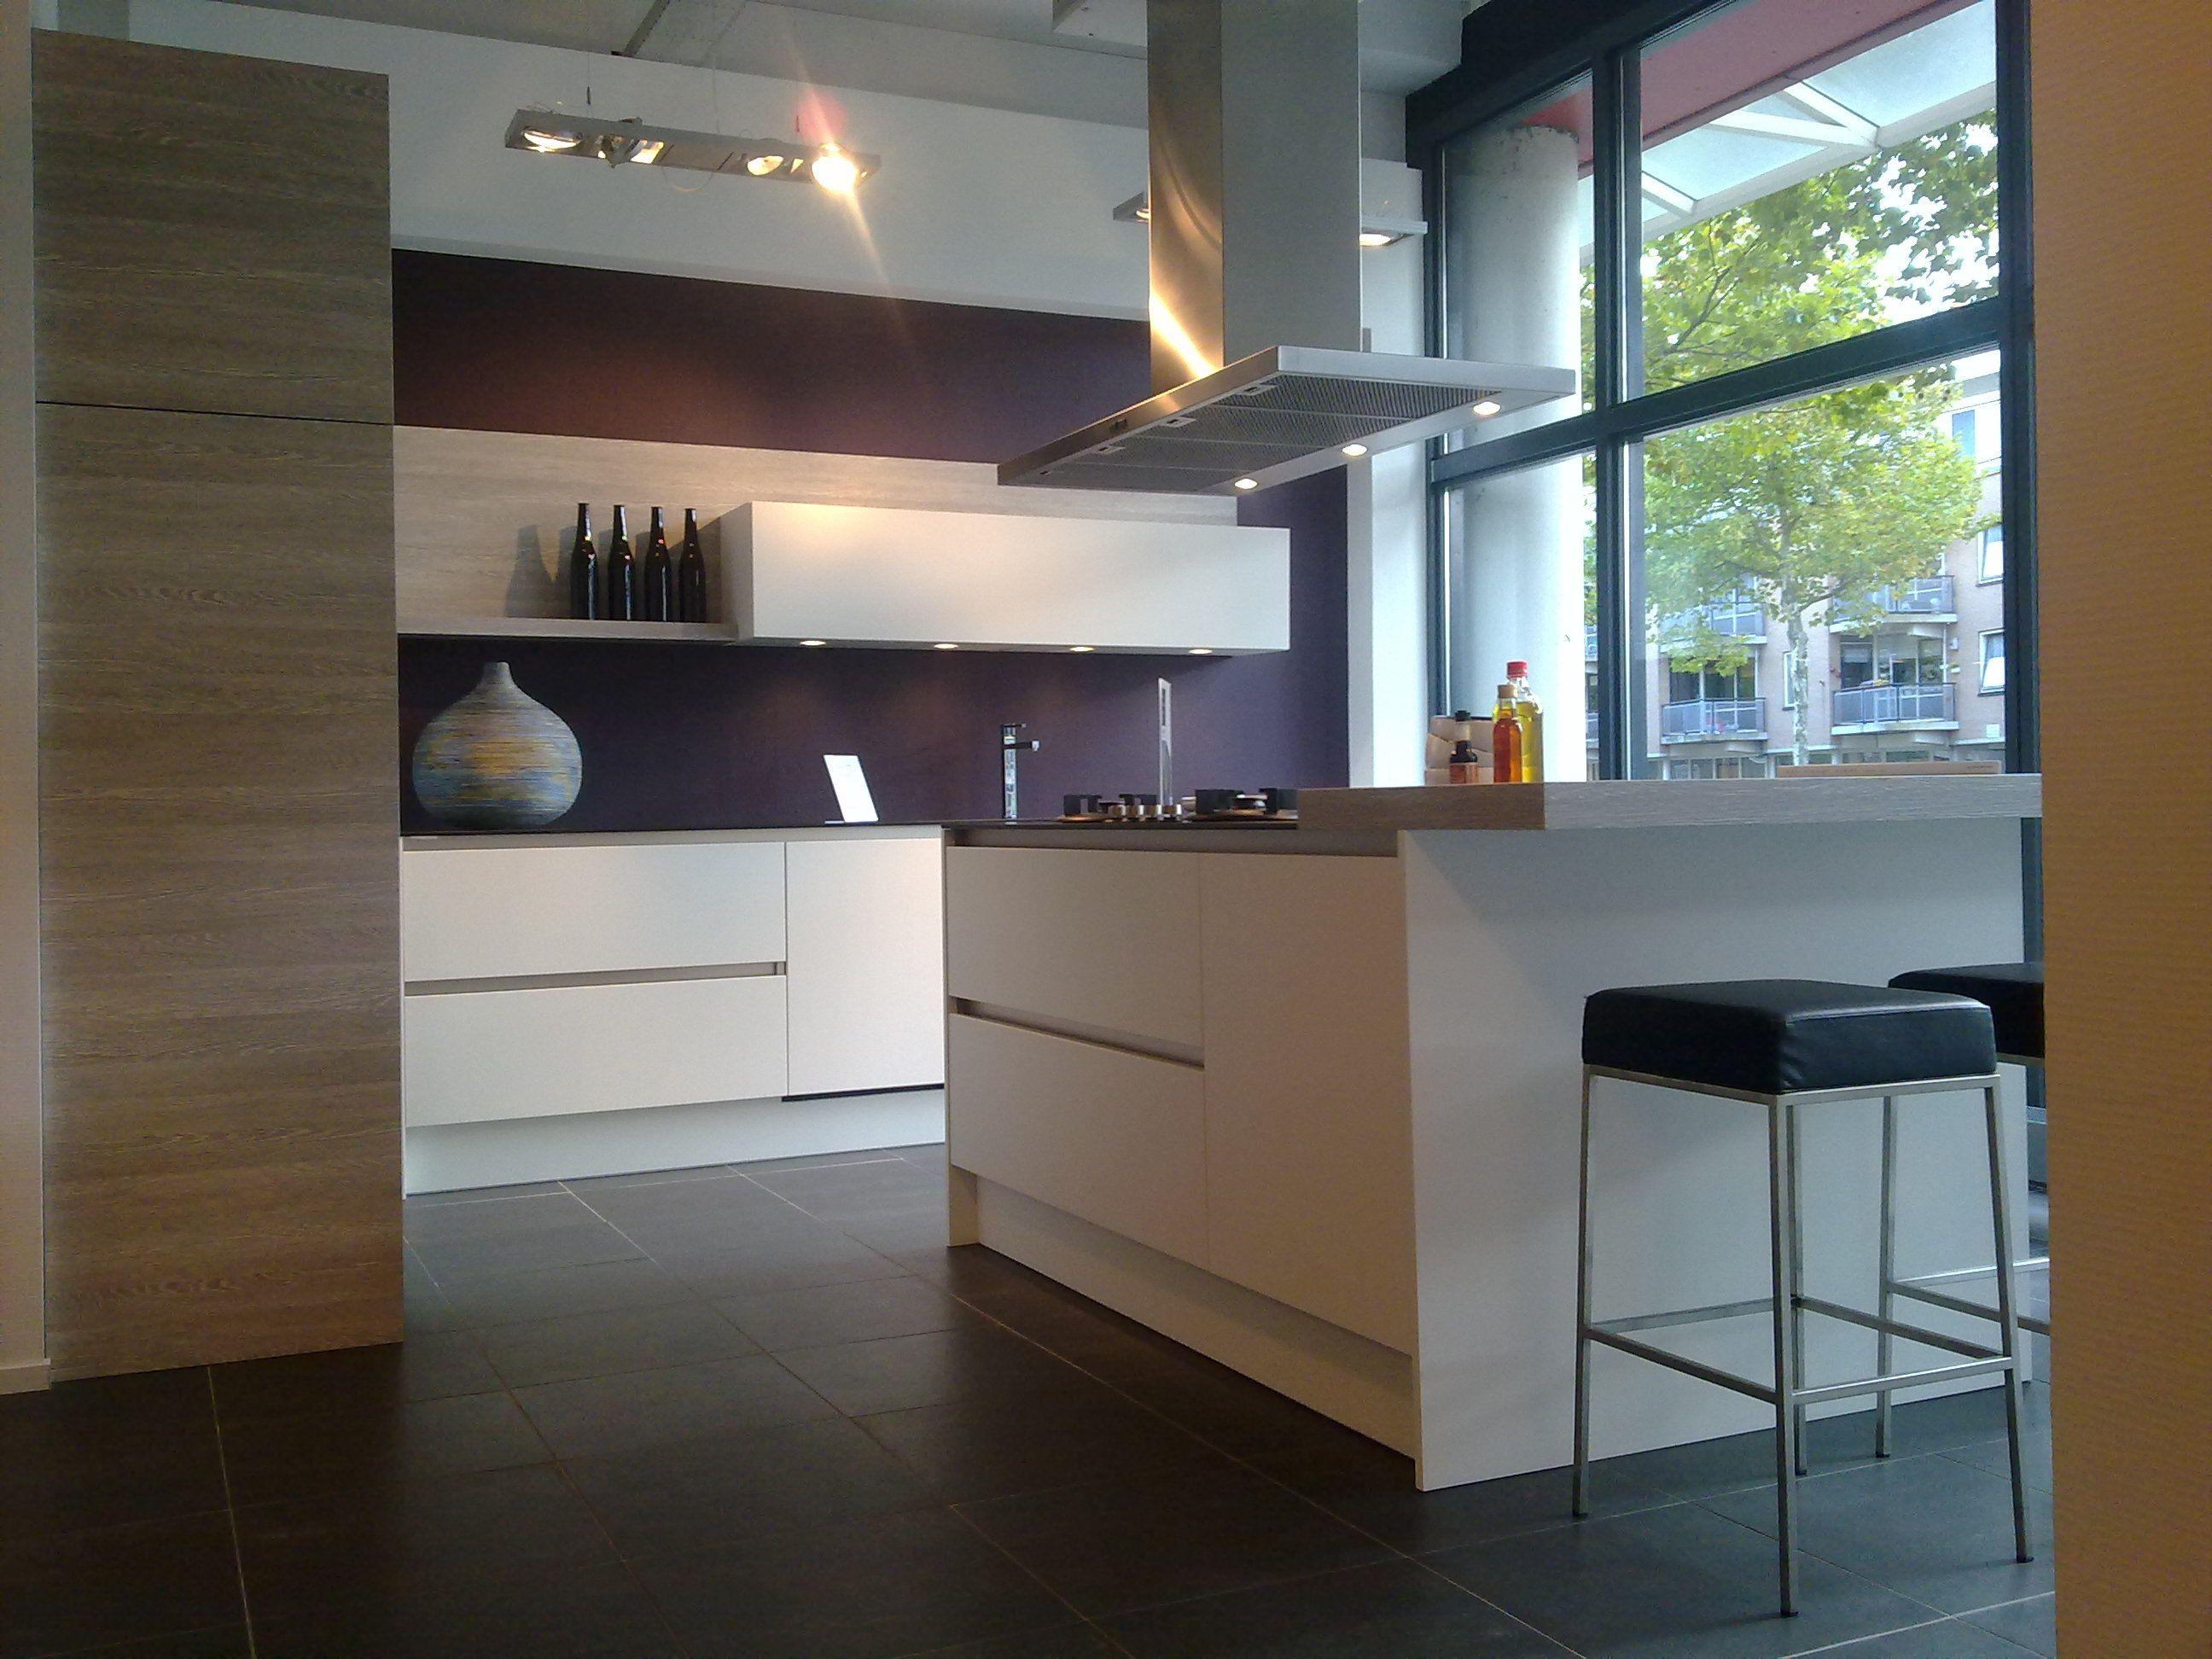 Keller keukens duitsland: keuken outlet roosendaal. elegant keller